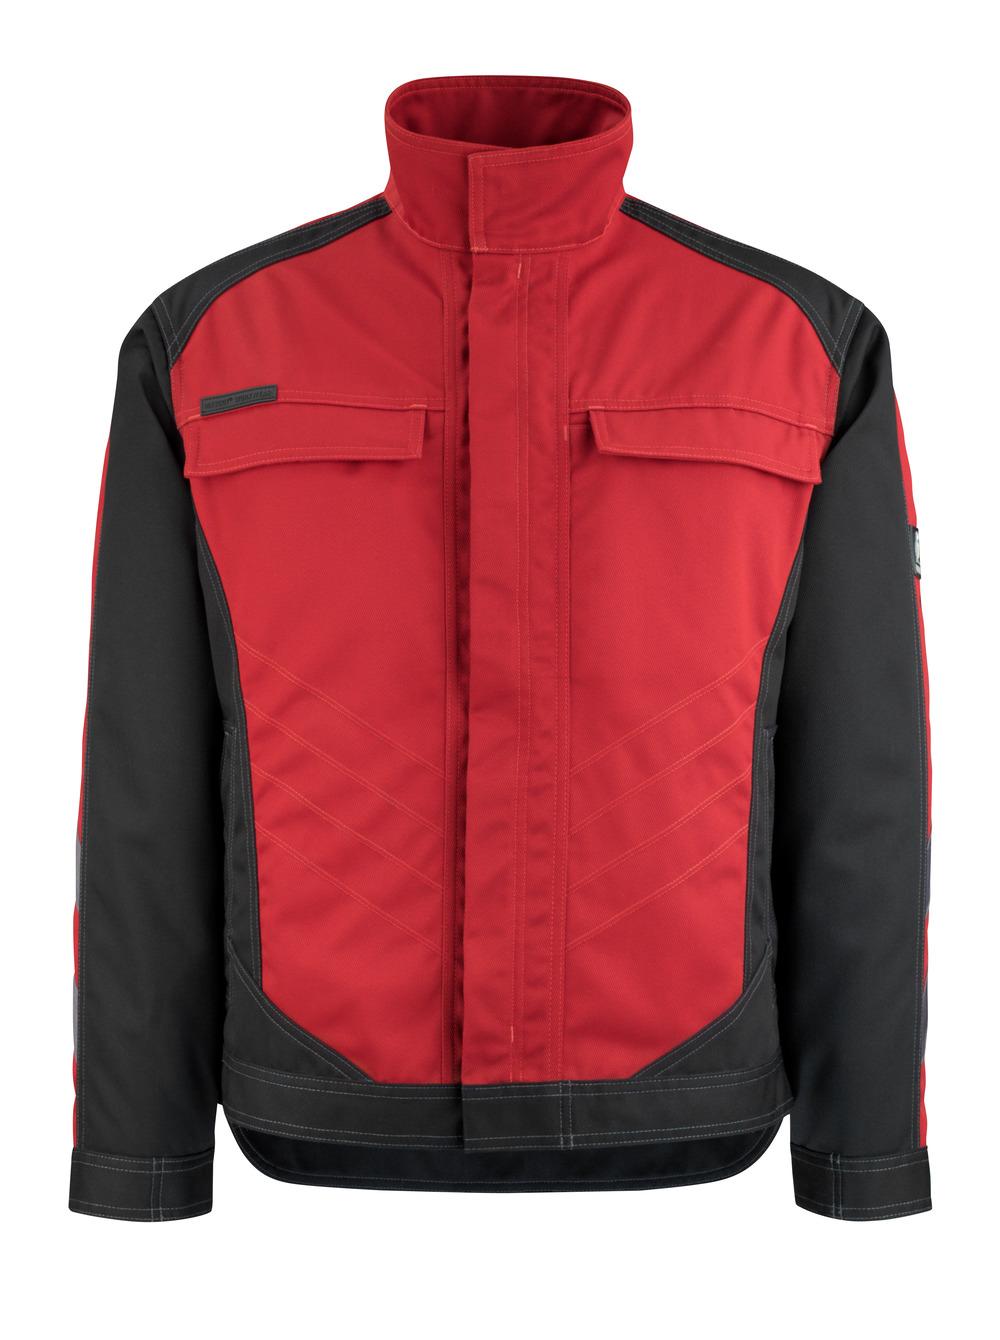 12009-203-0209 Jack - rood/zwart